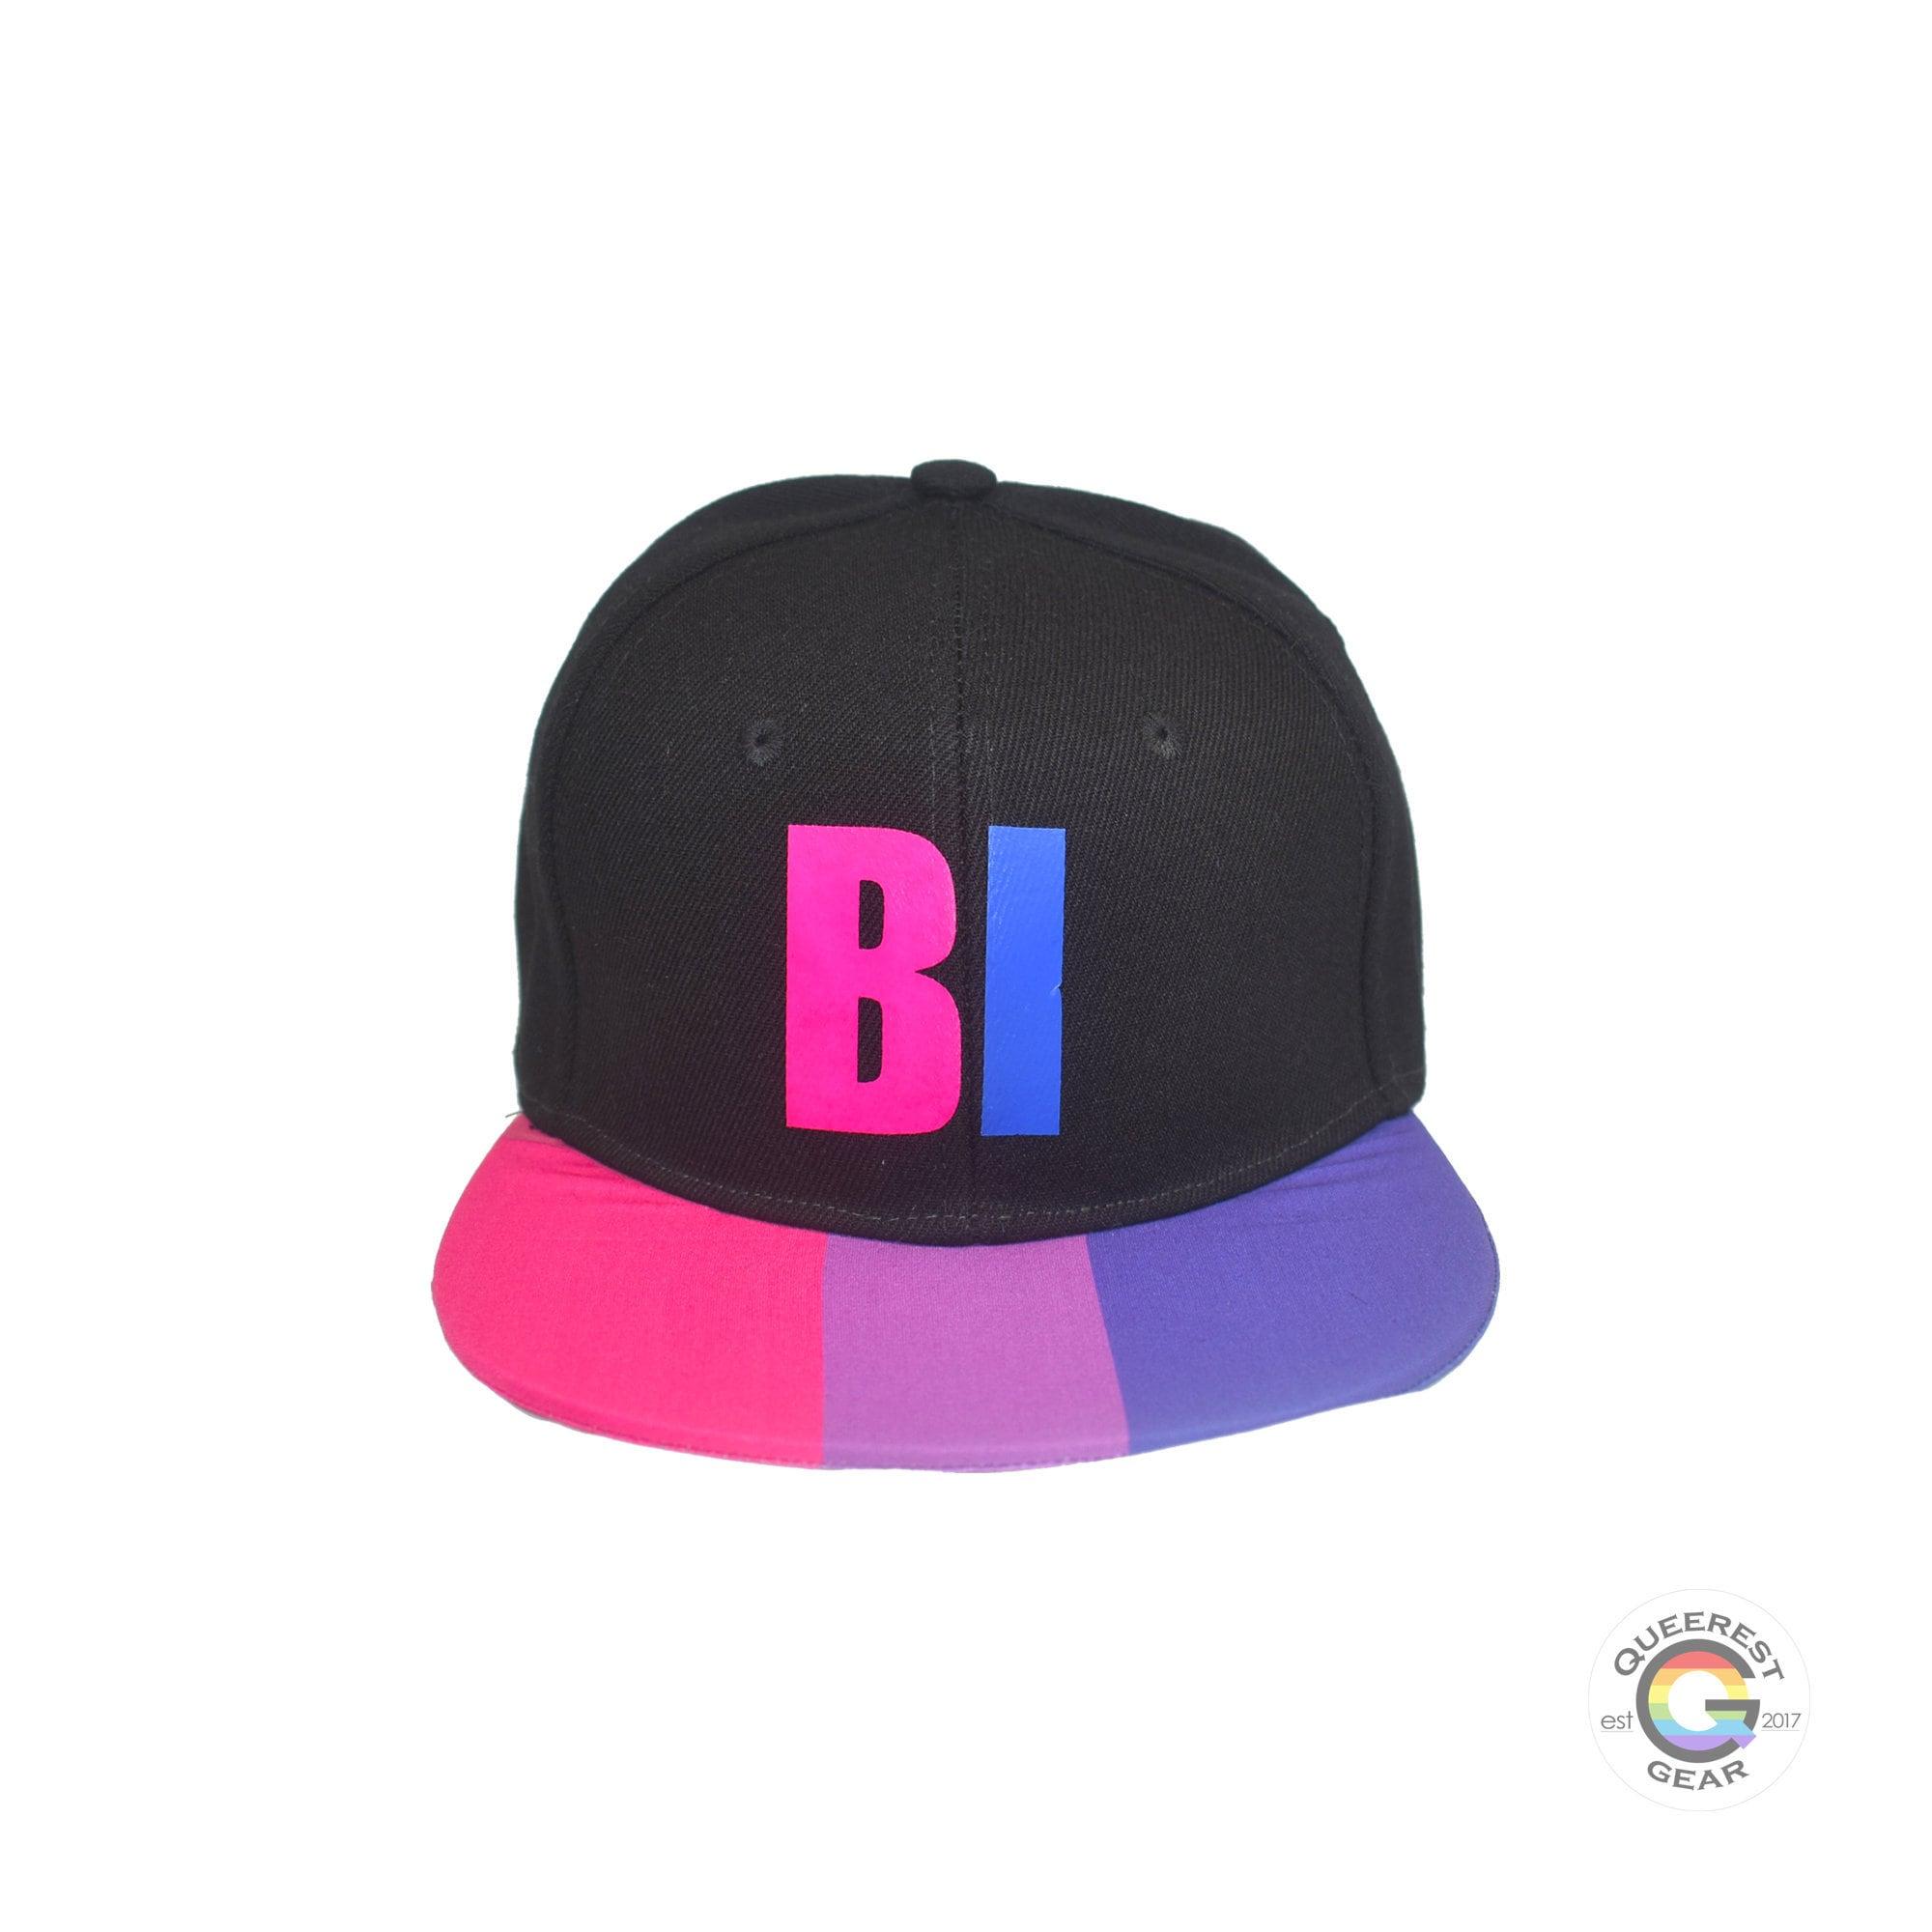 Bi Flag Queer Eye Embroidered Dad Hat Bisexual Flag Bisexual Gay Pride LGBTQ Bisexual Pride Bi Pride LGBT Flag LGBT Baseball Hat